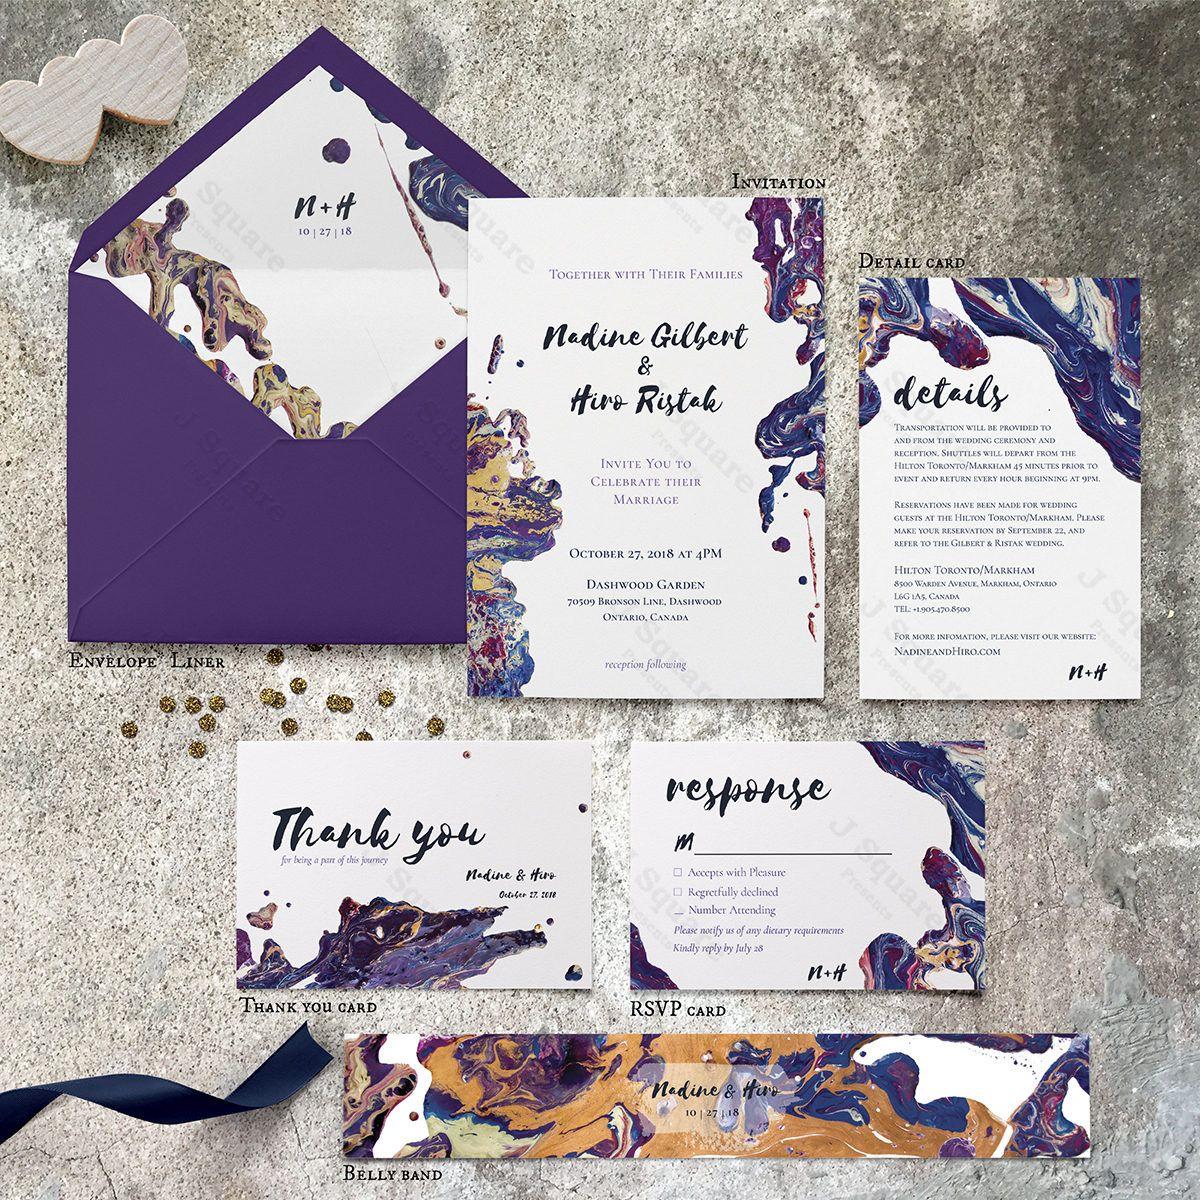 Acrylic Lux Paint Wedding Invitation Digital Wedding Suite Modern Wedding Invite Rsvp Detail Thank You Card Purple Navy Gold J2pwlp Digital Weddings Modern Wedding Invitations Printable Wedding Invitations